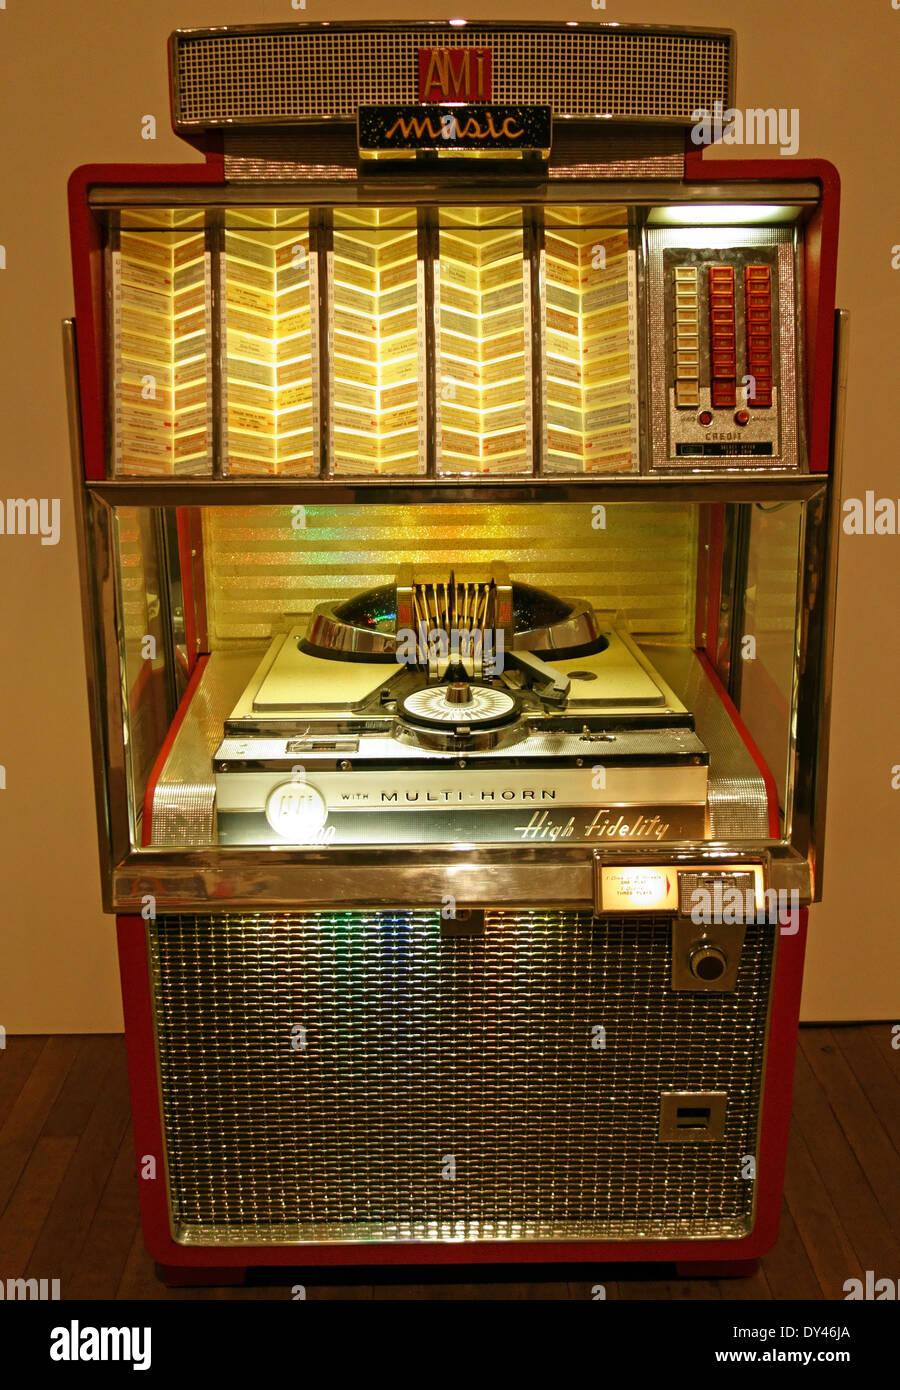 Jukebox 1960s Stock Photos Amp Jukebox 1960s Stock Images